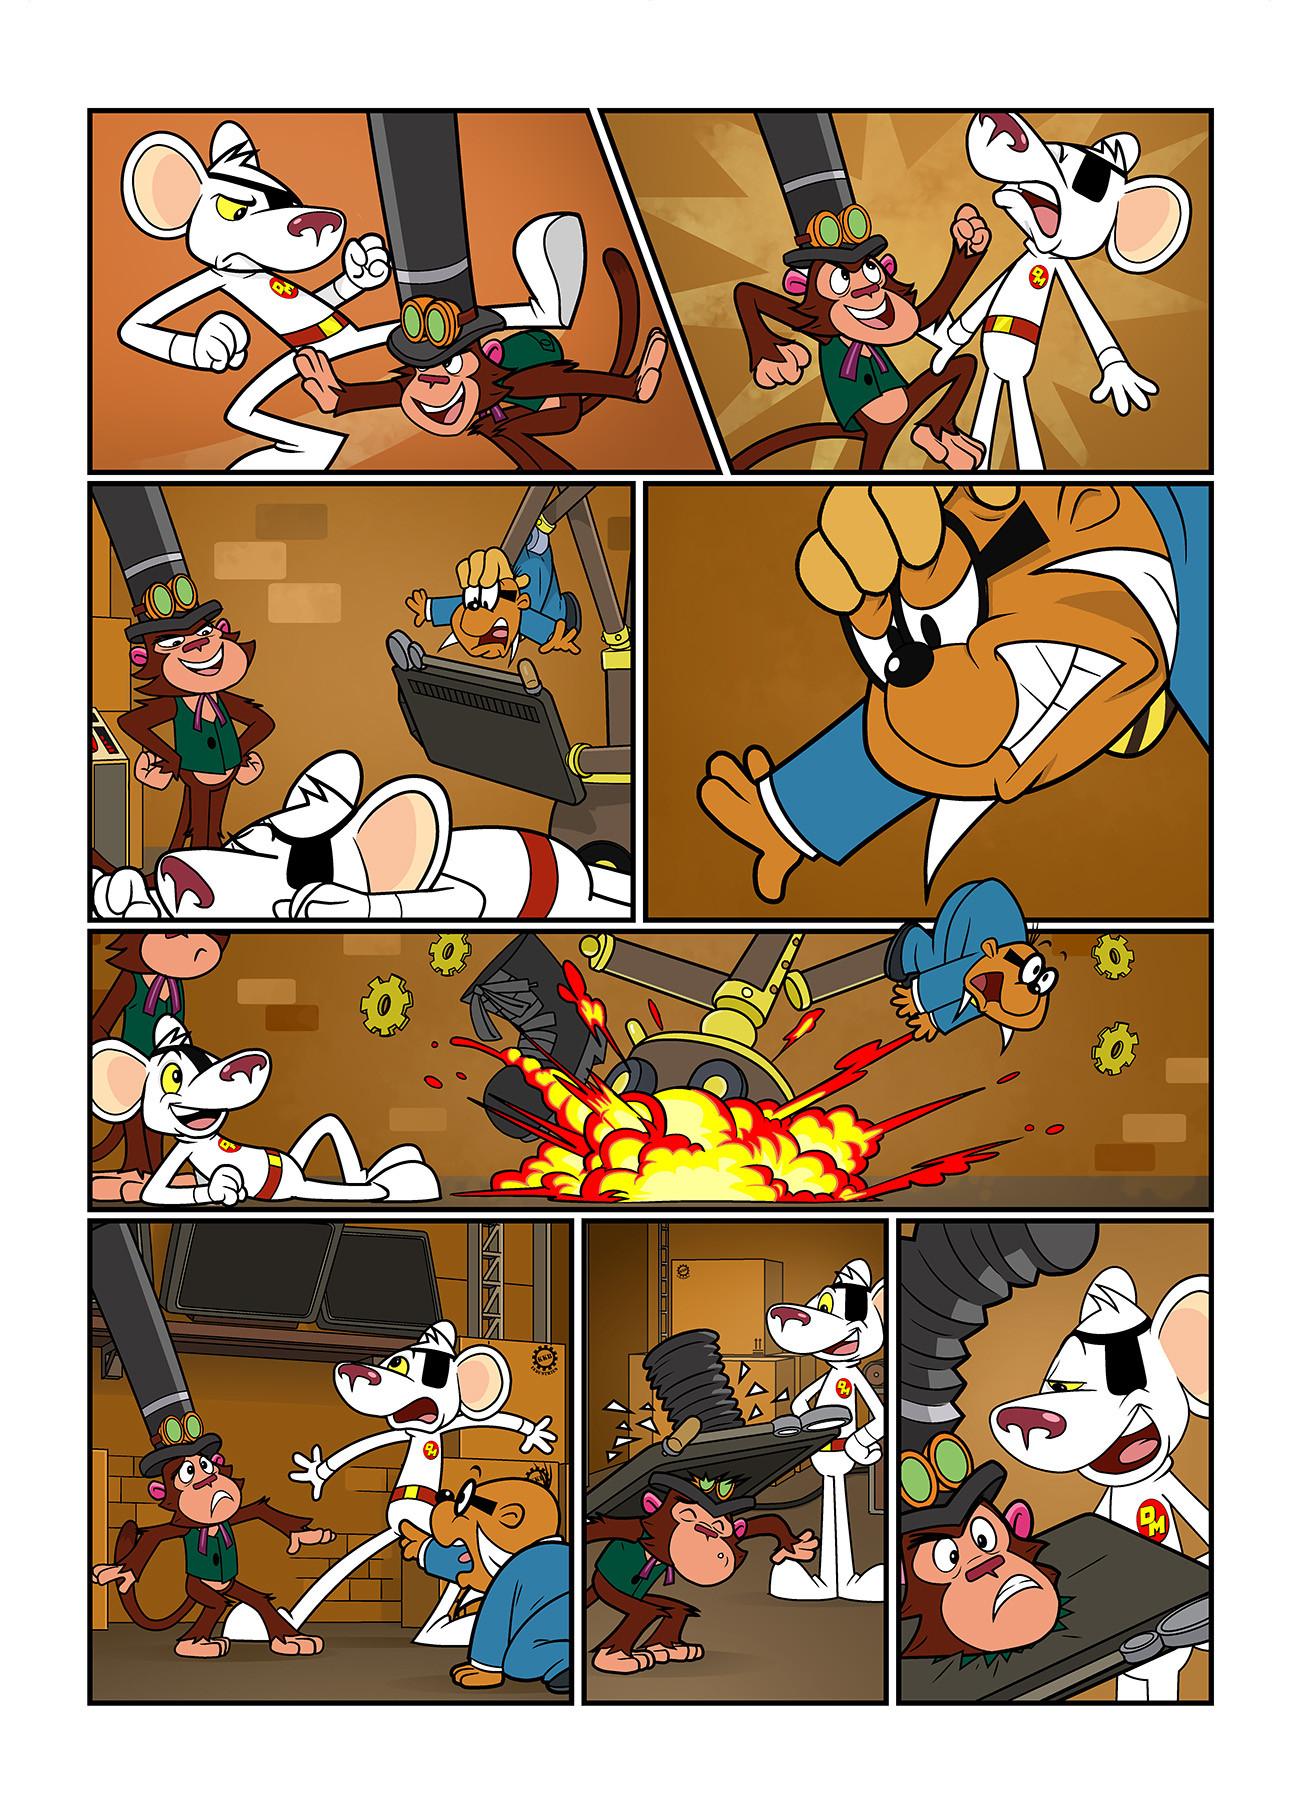 Joe amp rob sharp dm comic issue 10 page 07